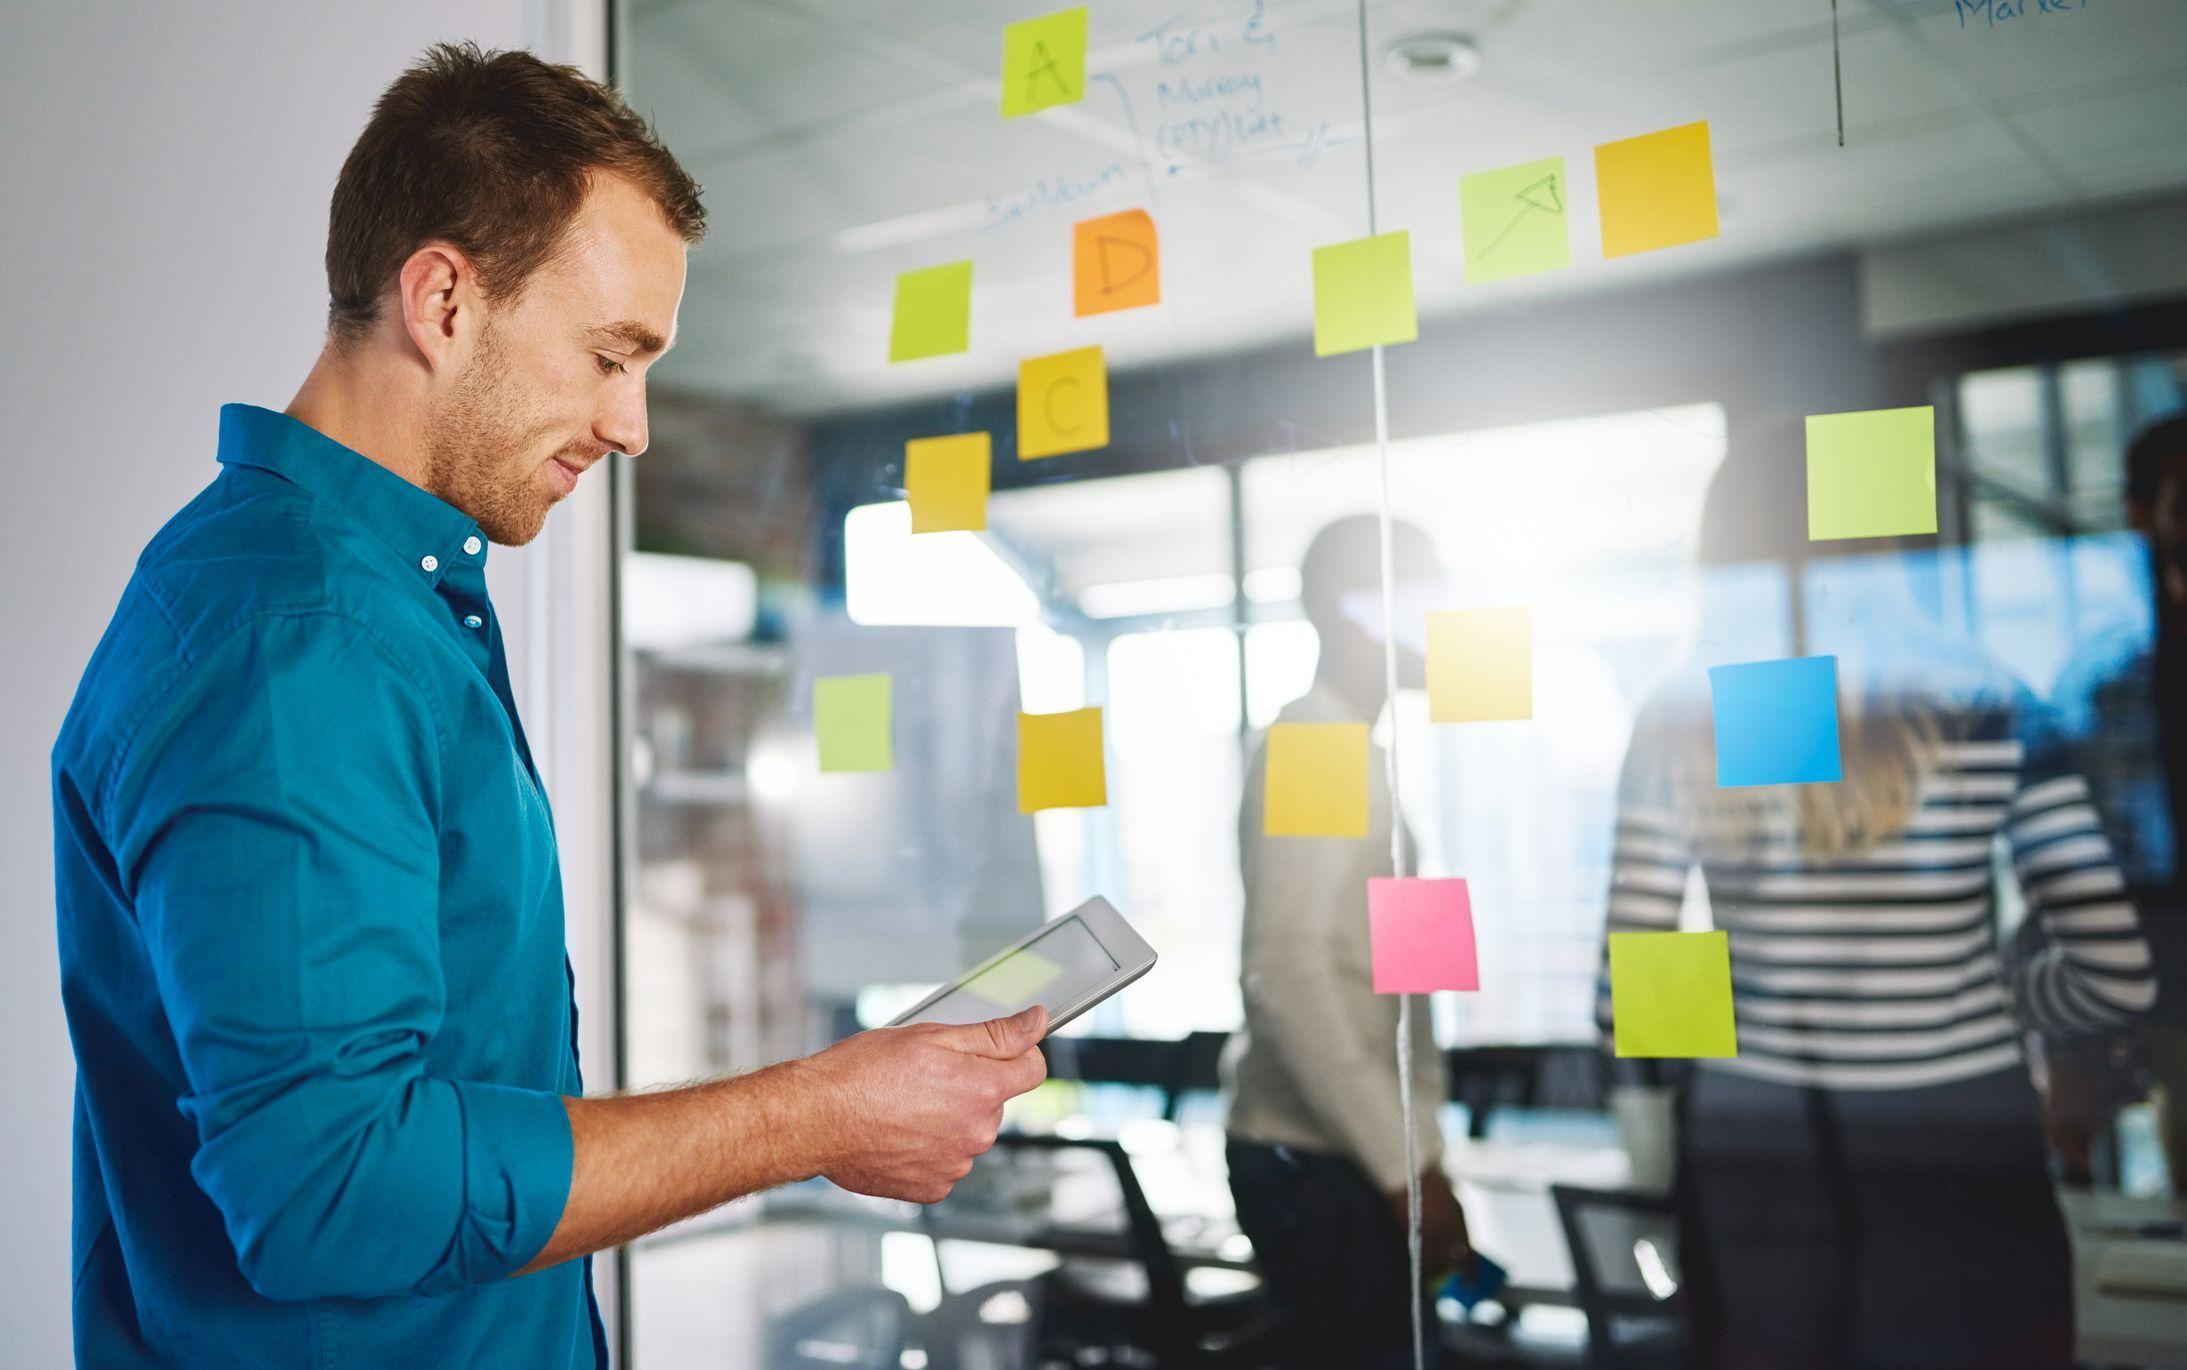 The 8 Best Organizational Apps of 2020 Best organization